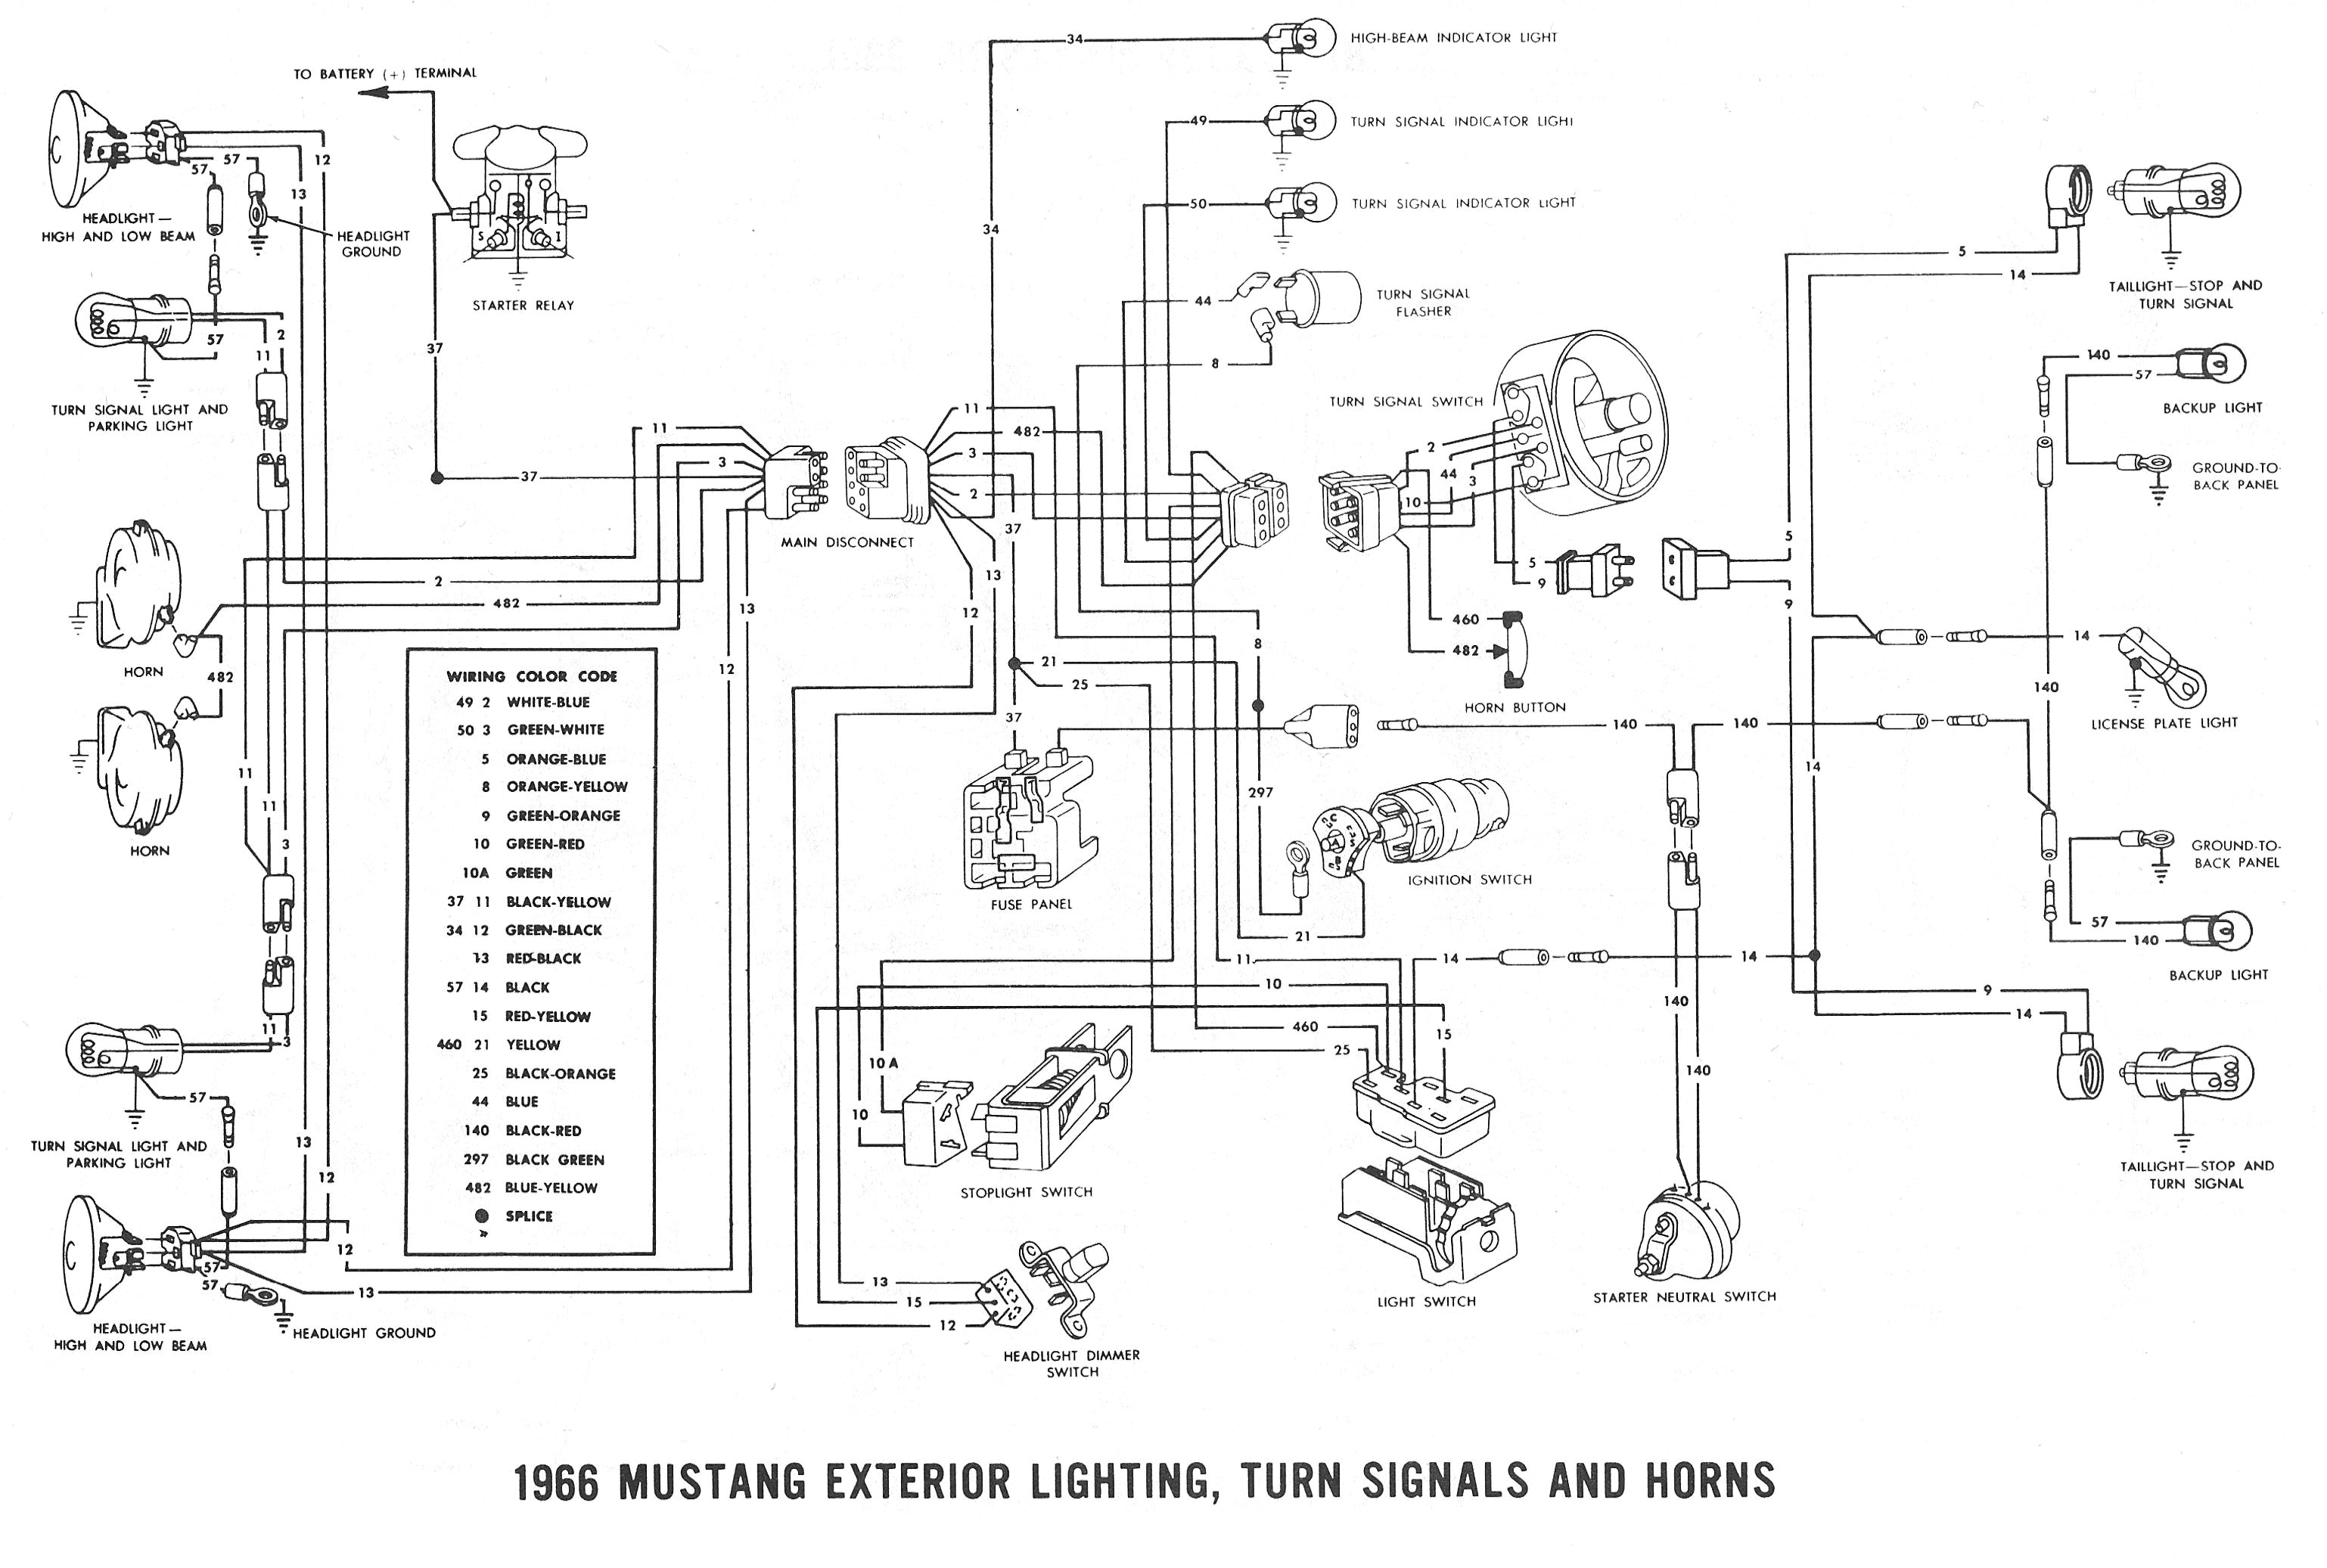 tortoise point motor wiring diagram unique mobile home wiring diagrams emprendedorlink wire data schema